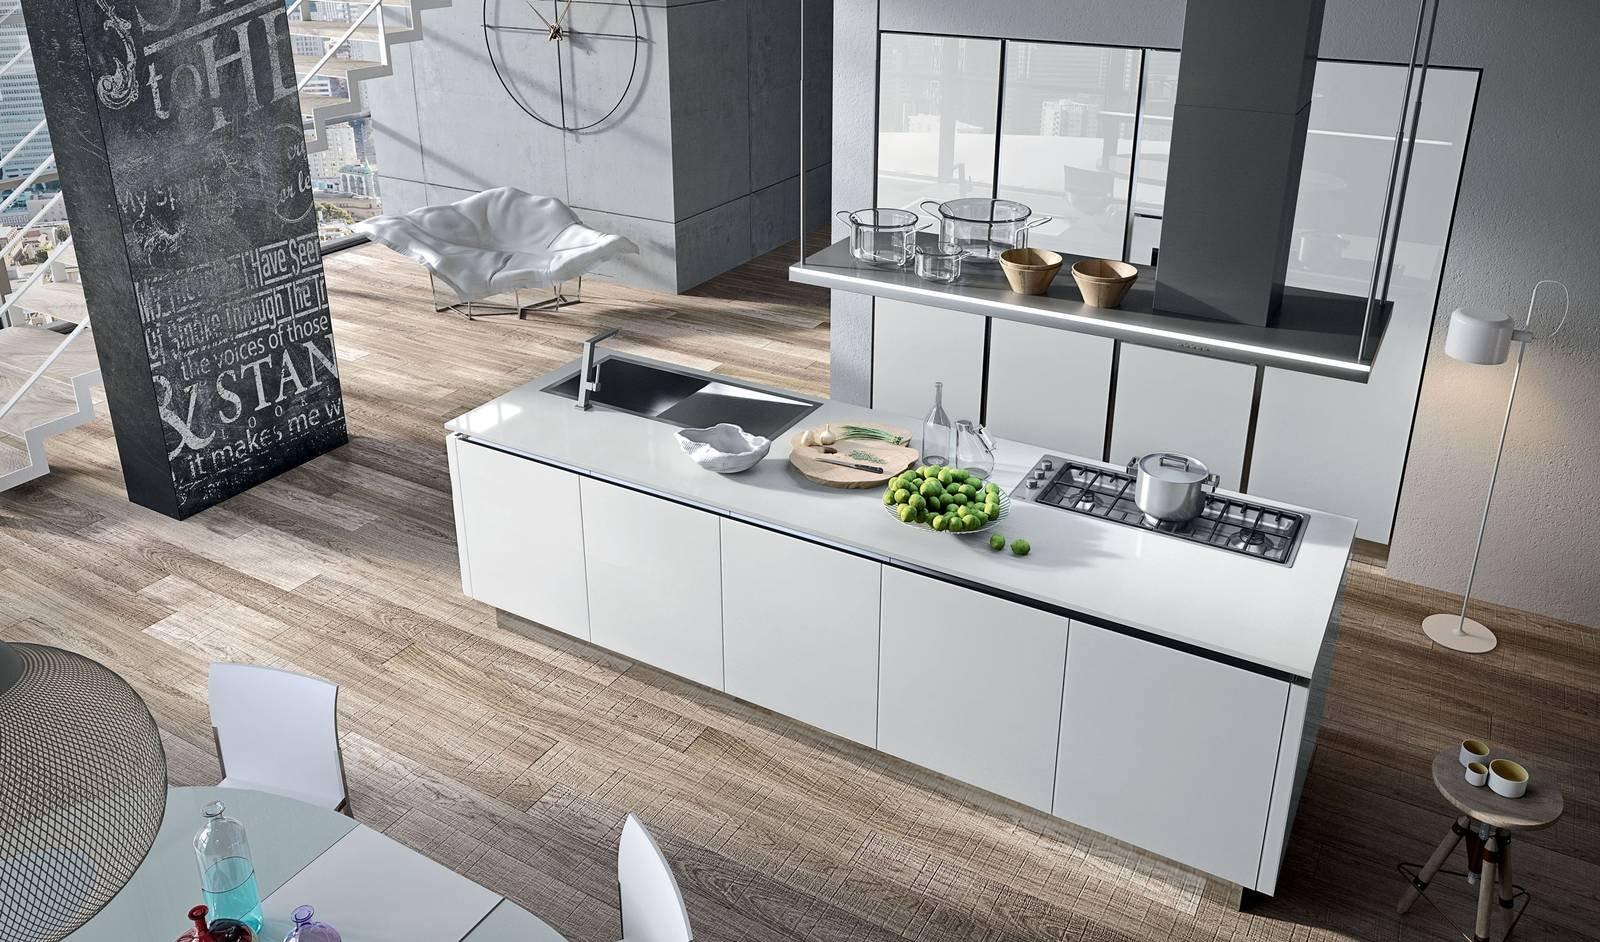 Cucina con l isola in genere divise in due blocchi - Cucina con l isola ...